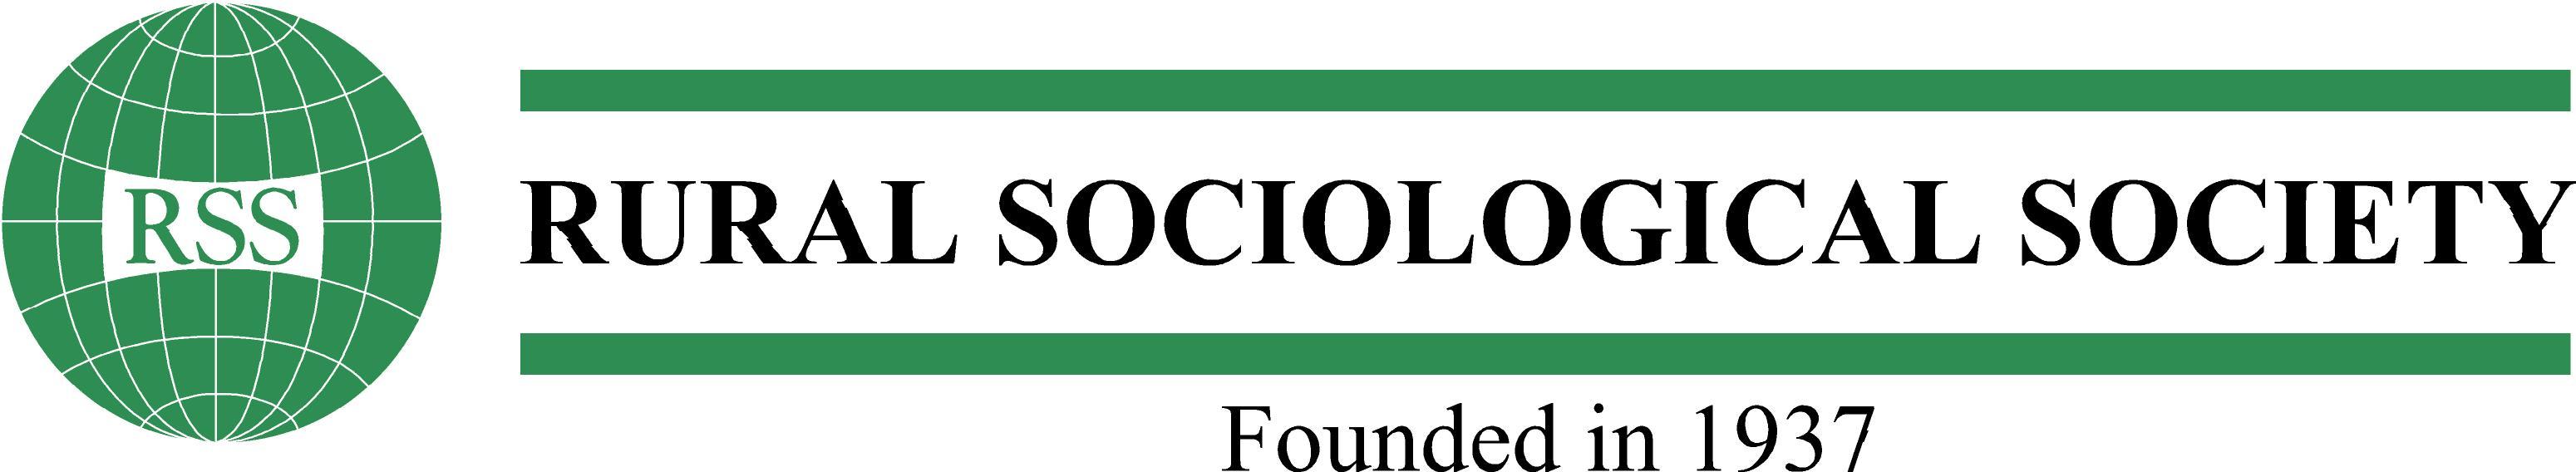 logo for Rural Sociological Society